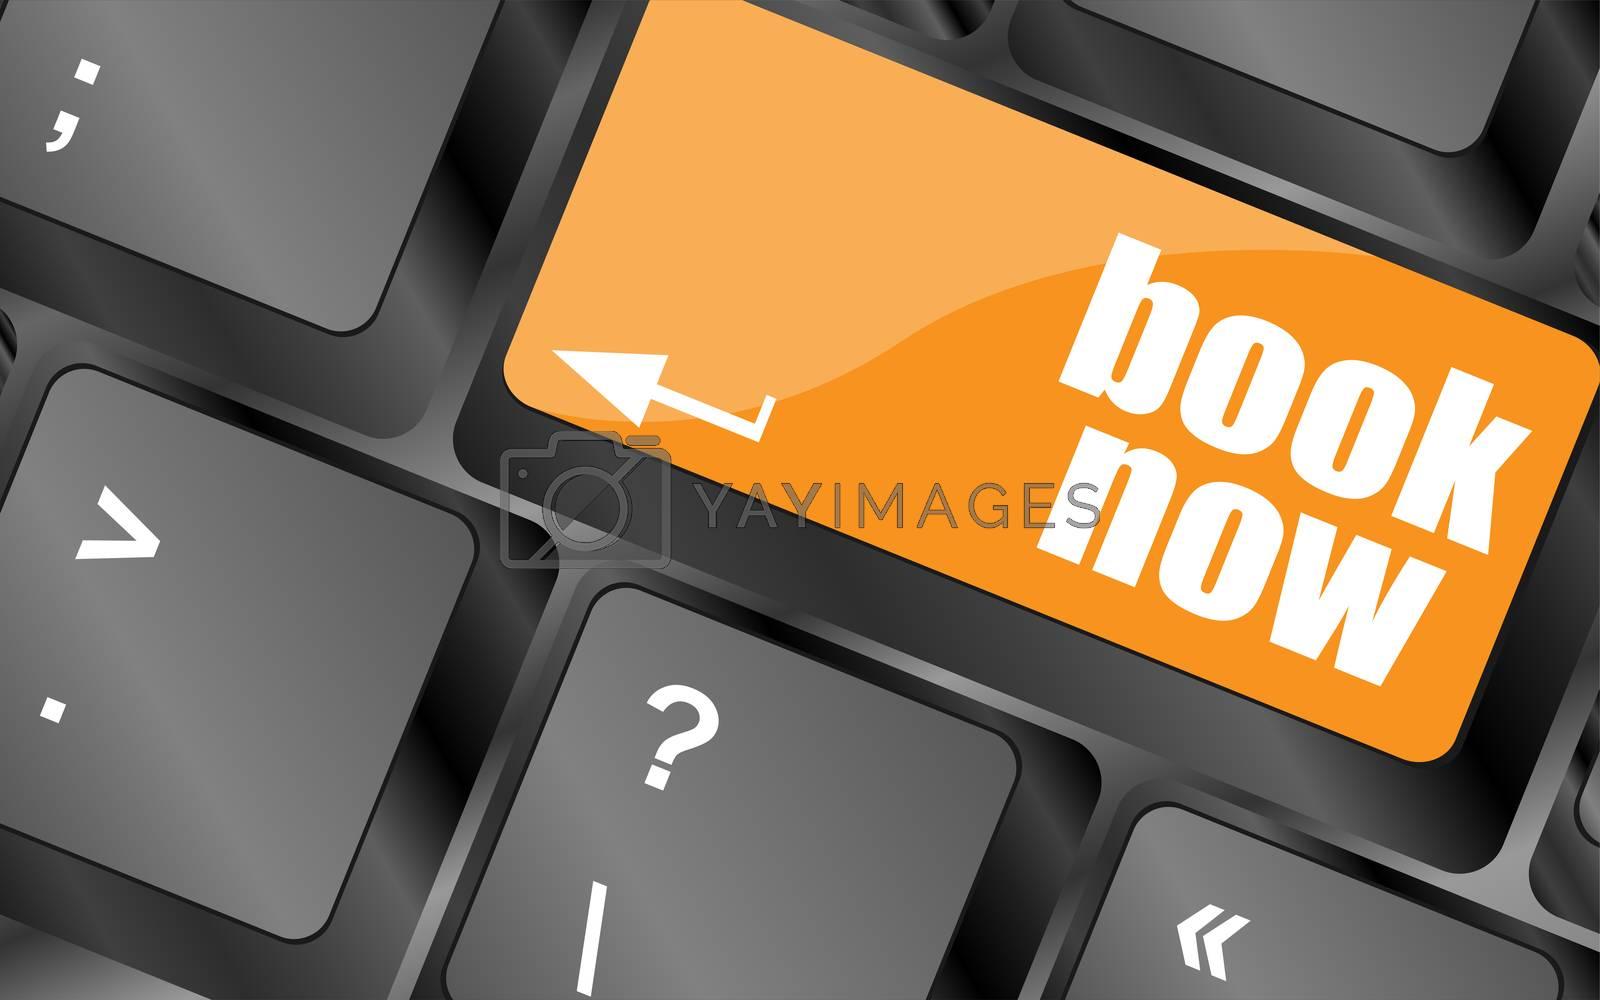 Book now button on keyboard key, web icon, web button